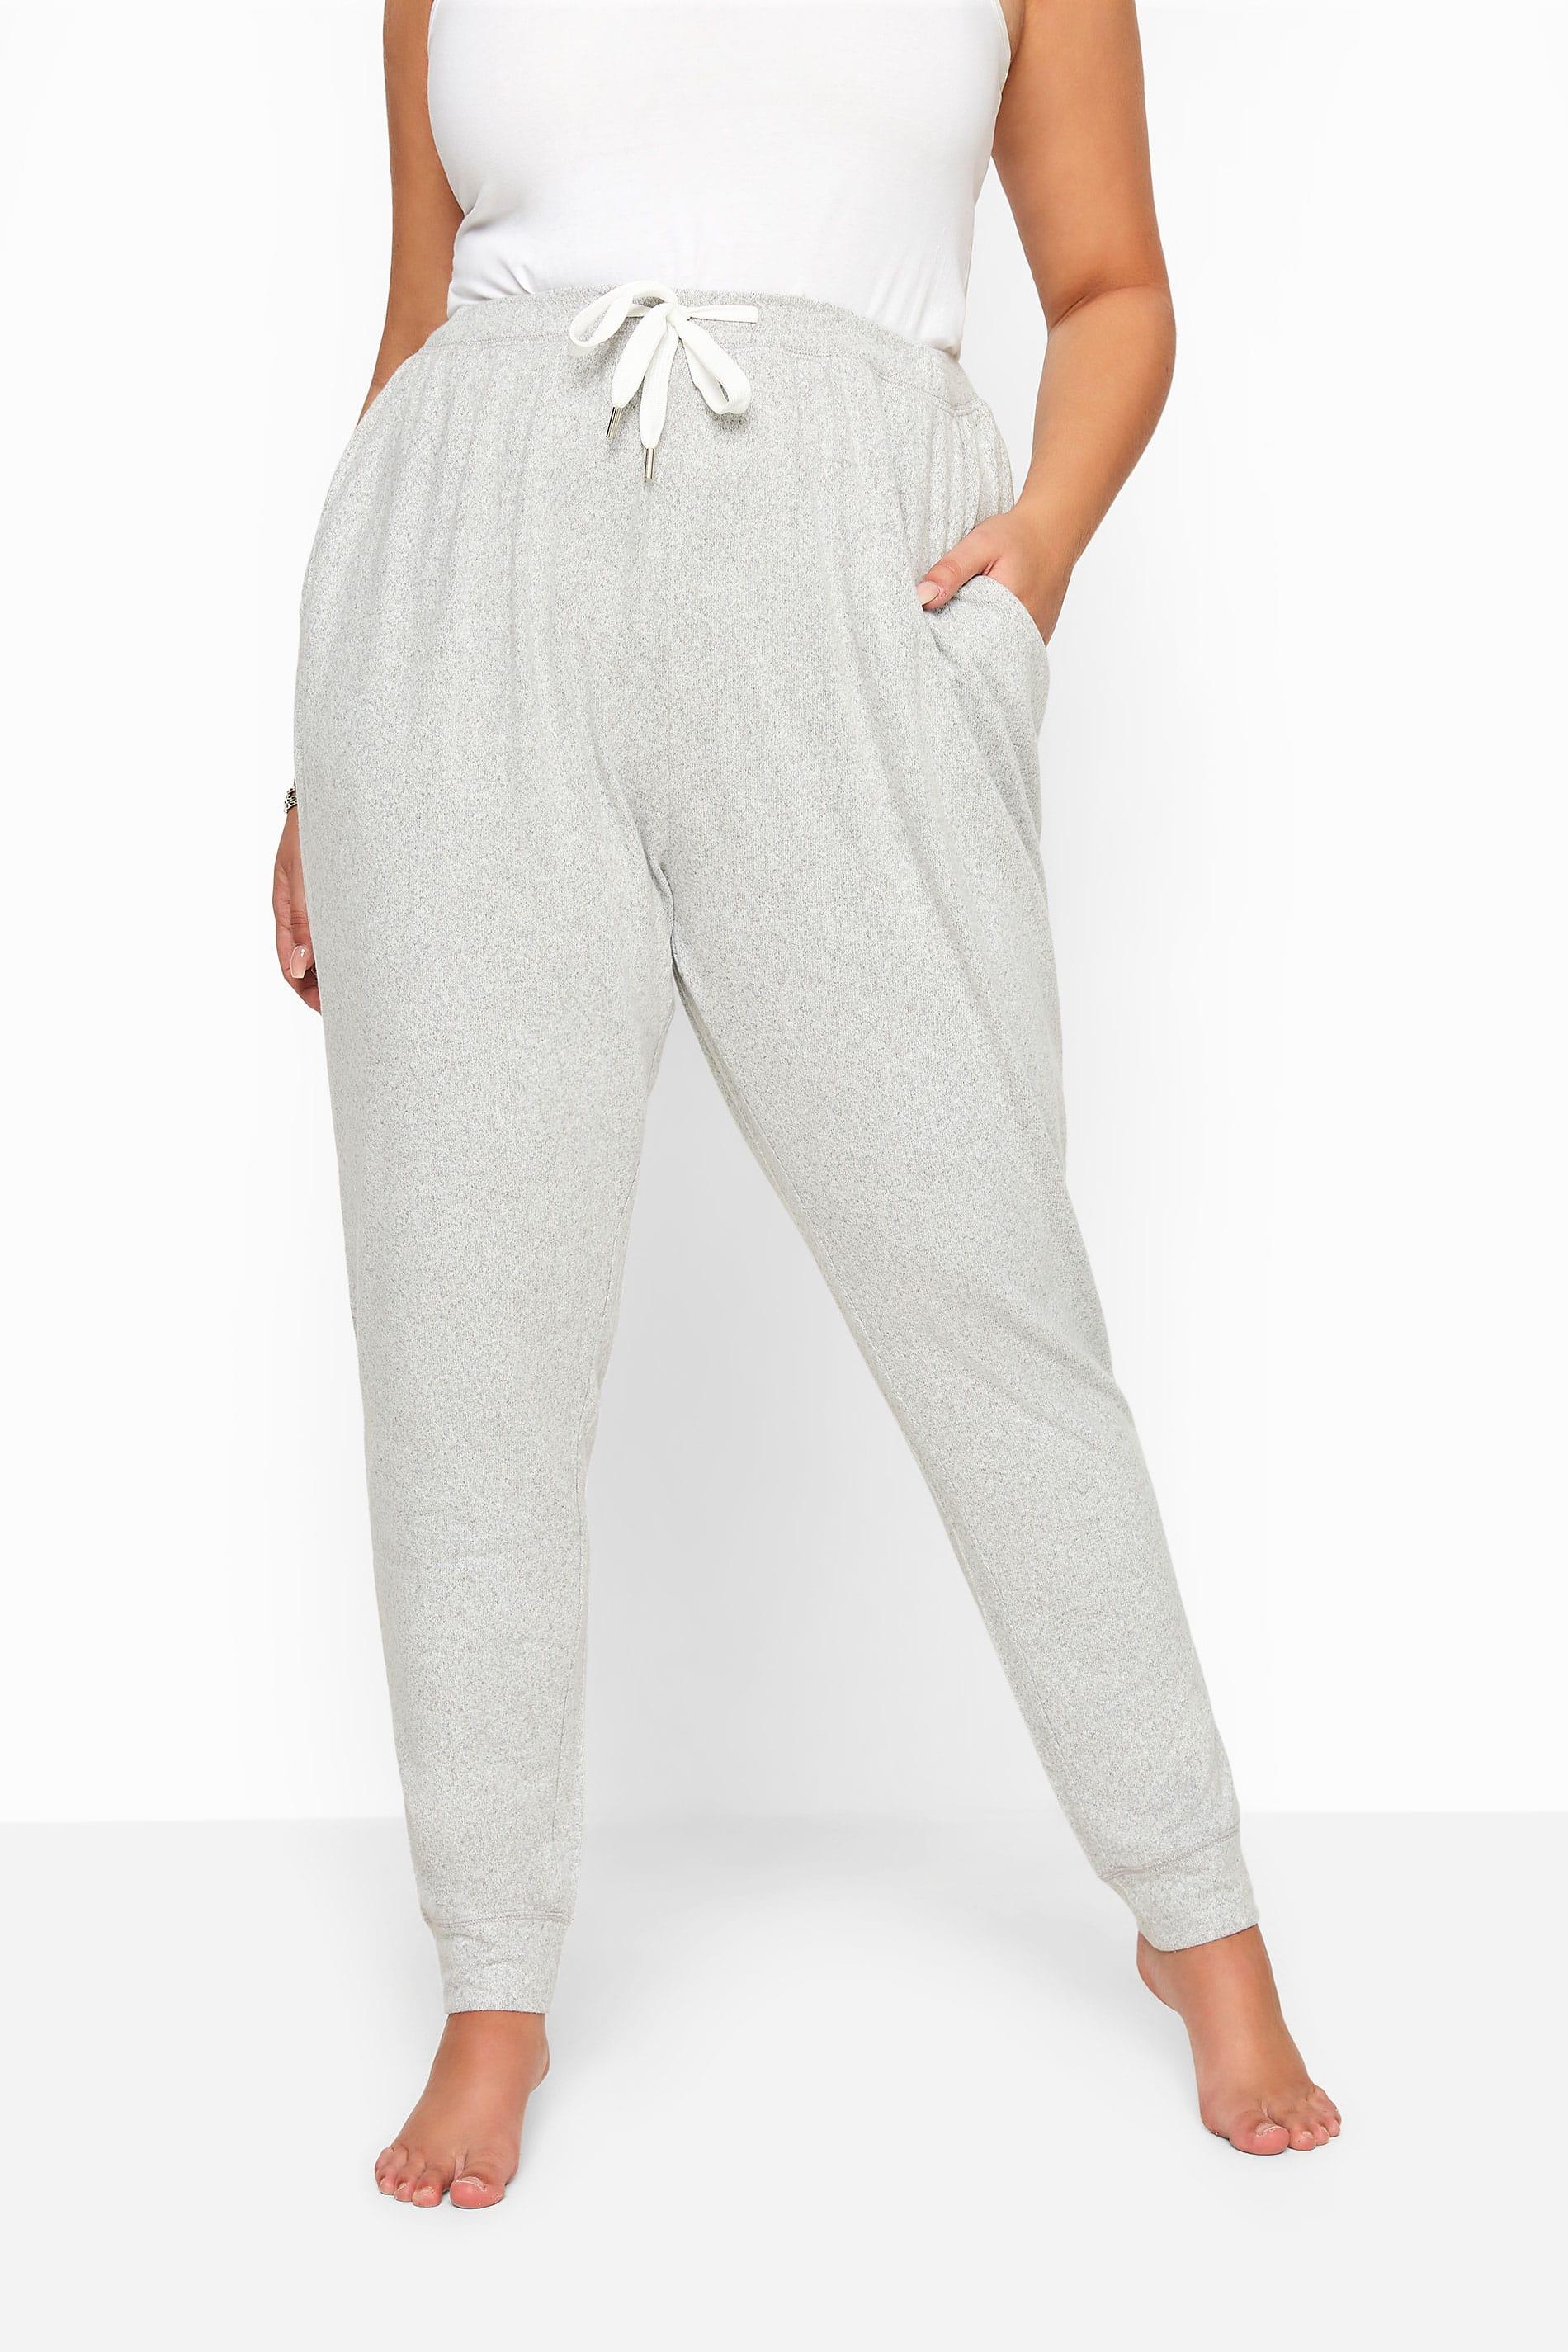 Grey Marl Soft Jersey Lounge Pants_2ade.jpg